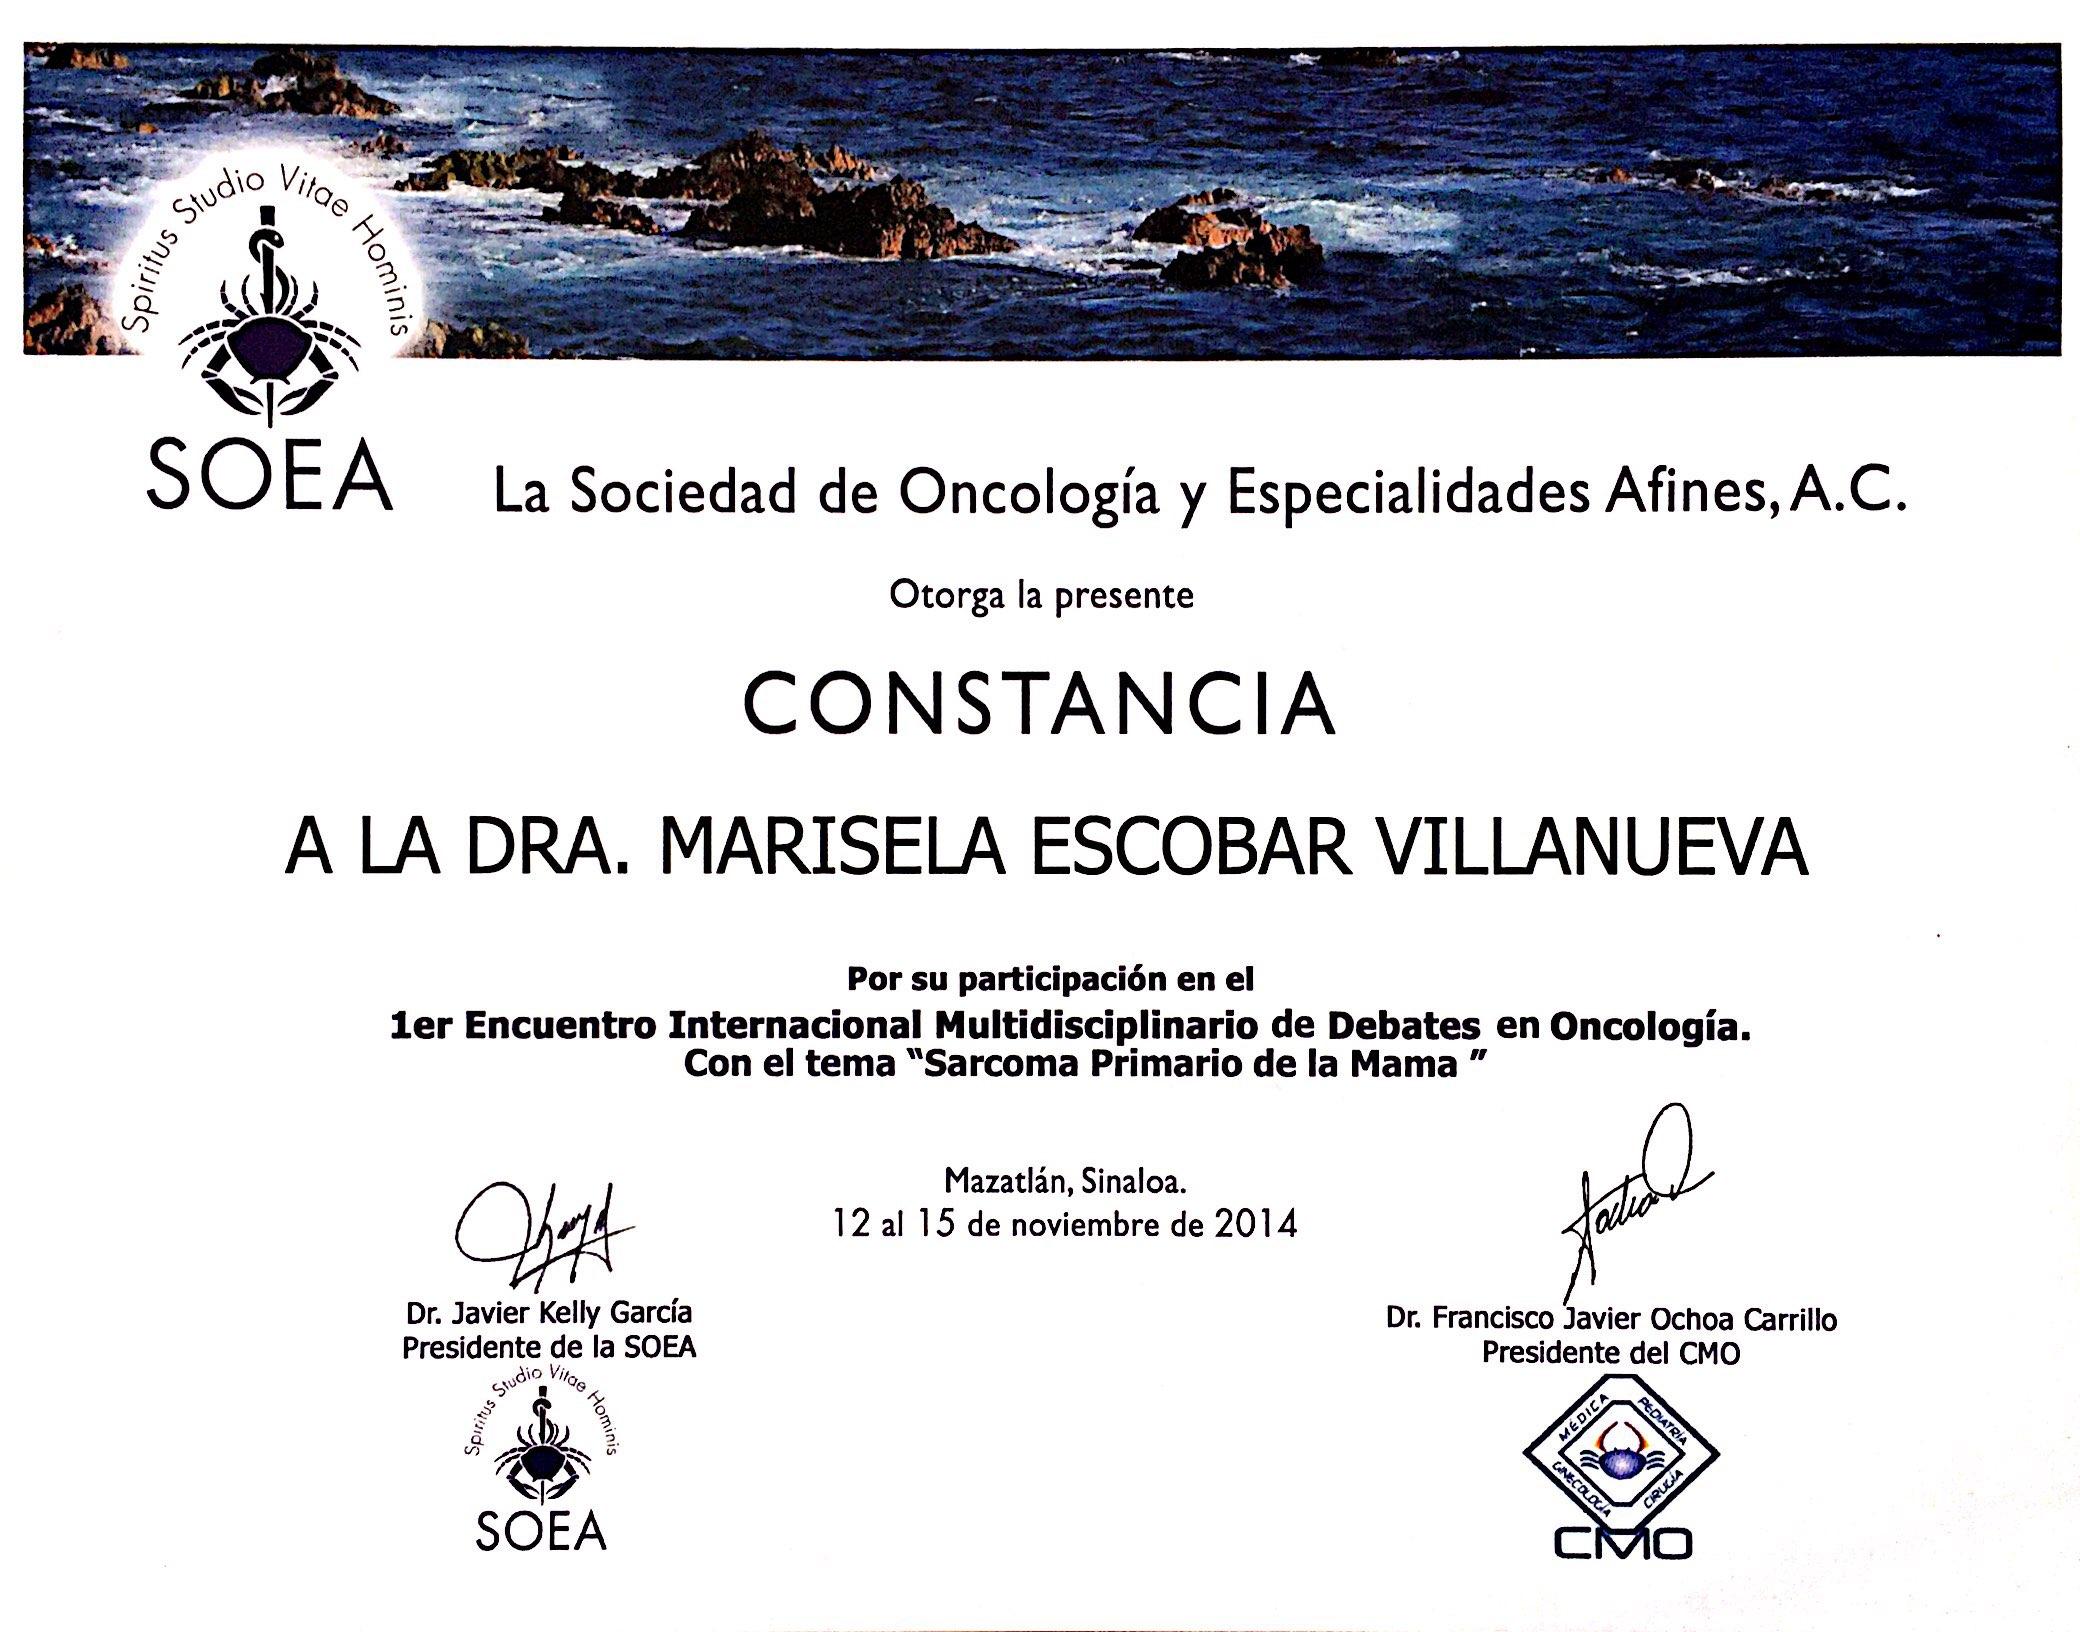 Nuevo doc 2018-02-20 11.21.39_38